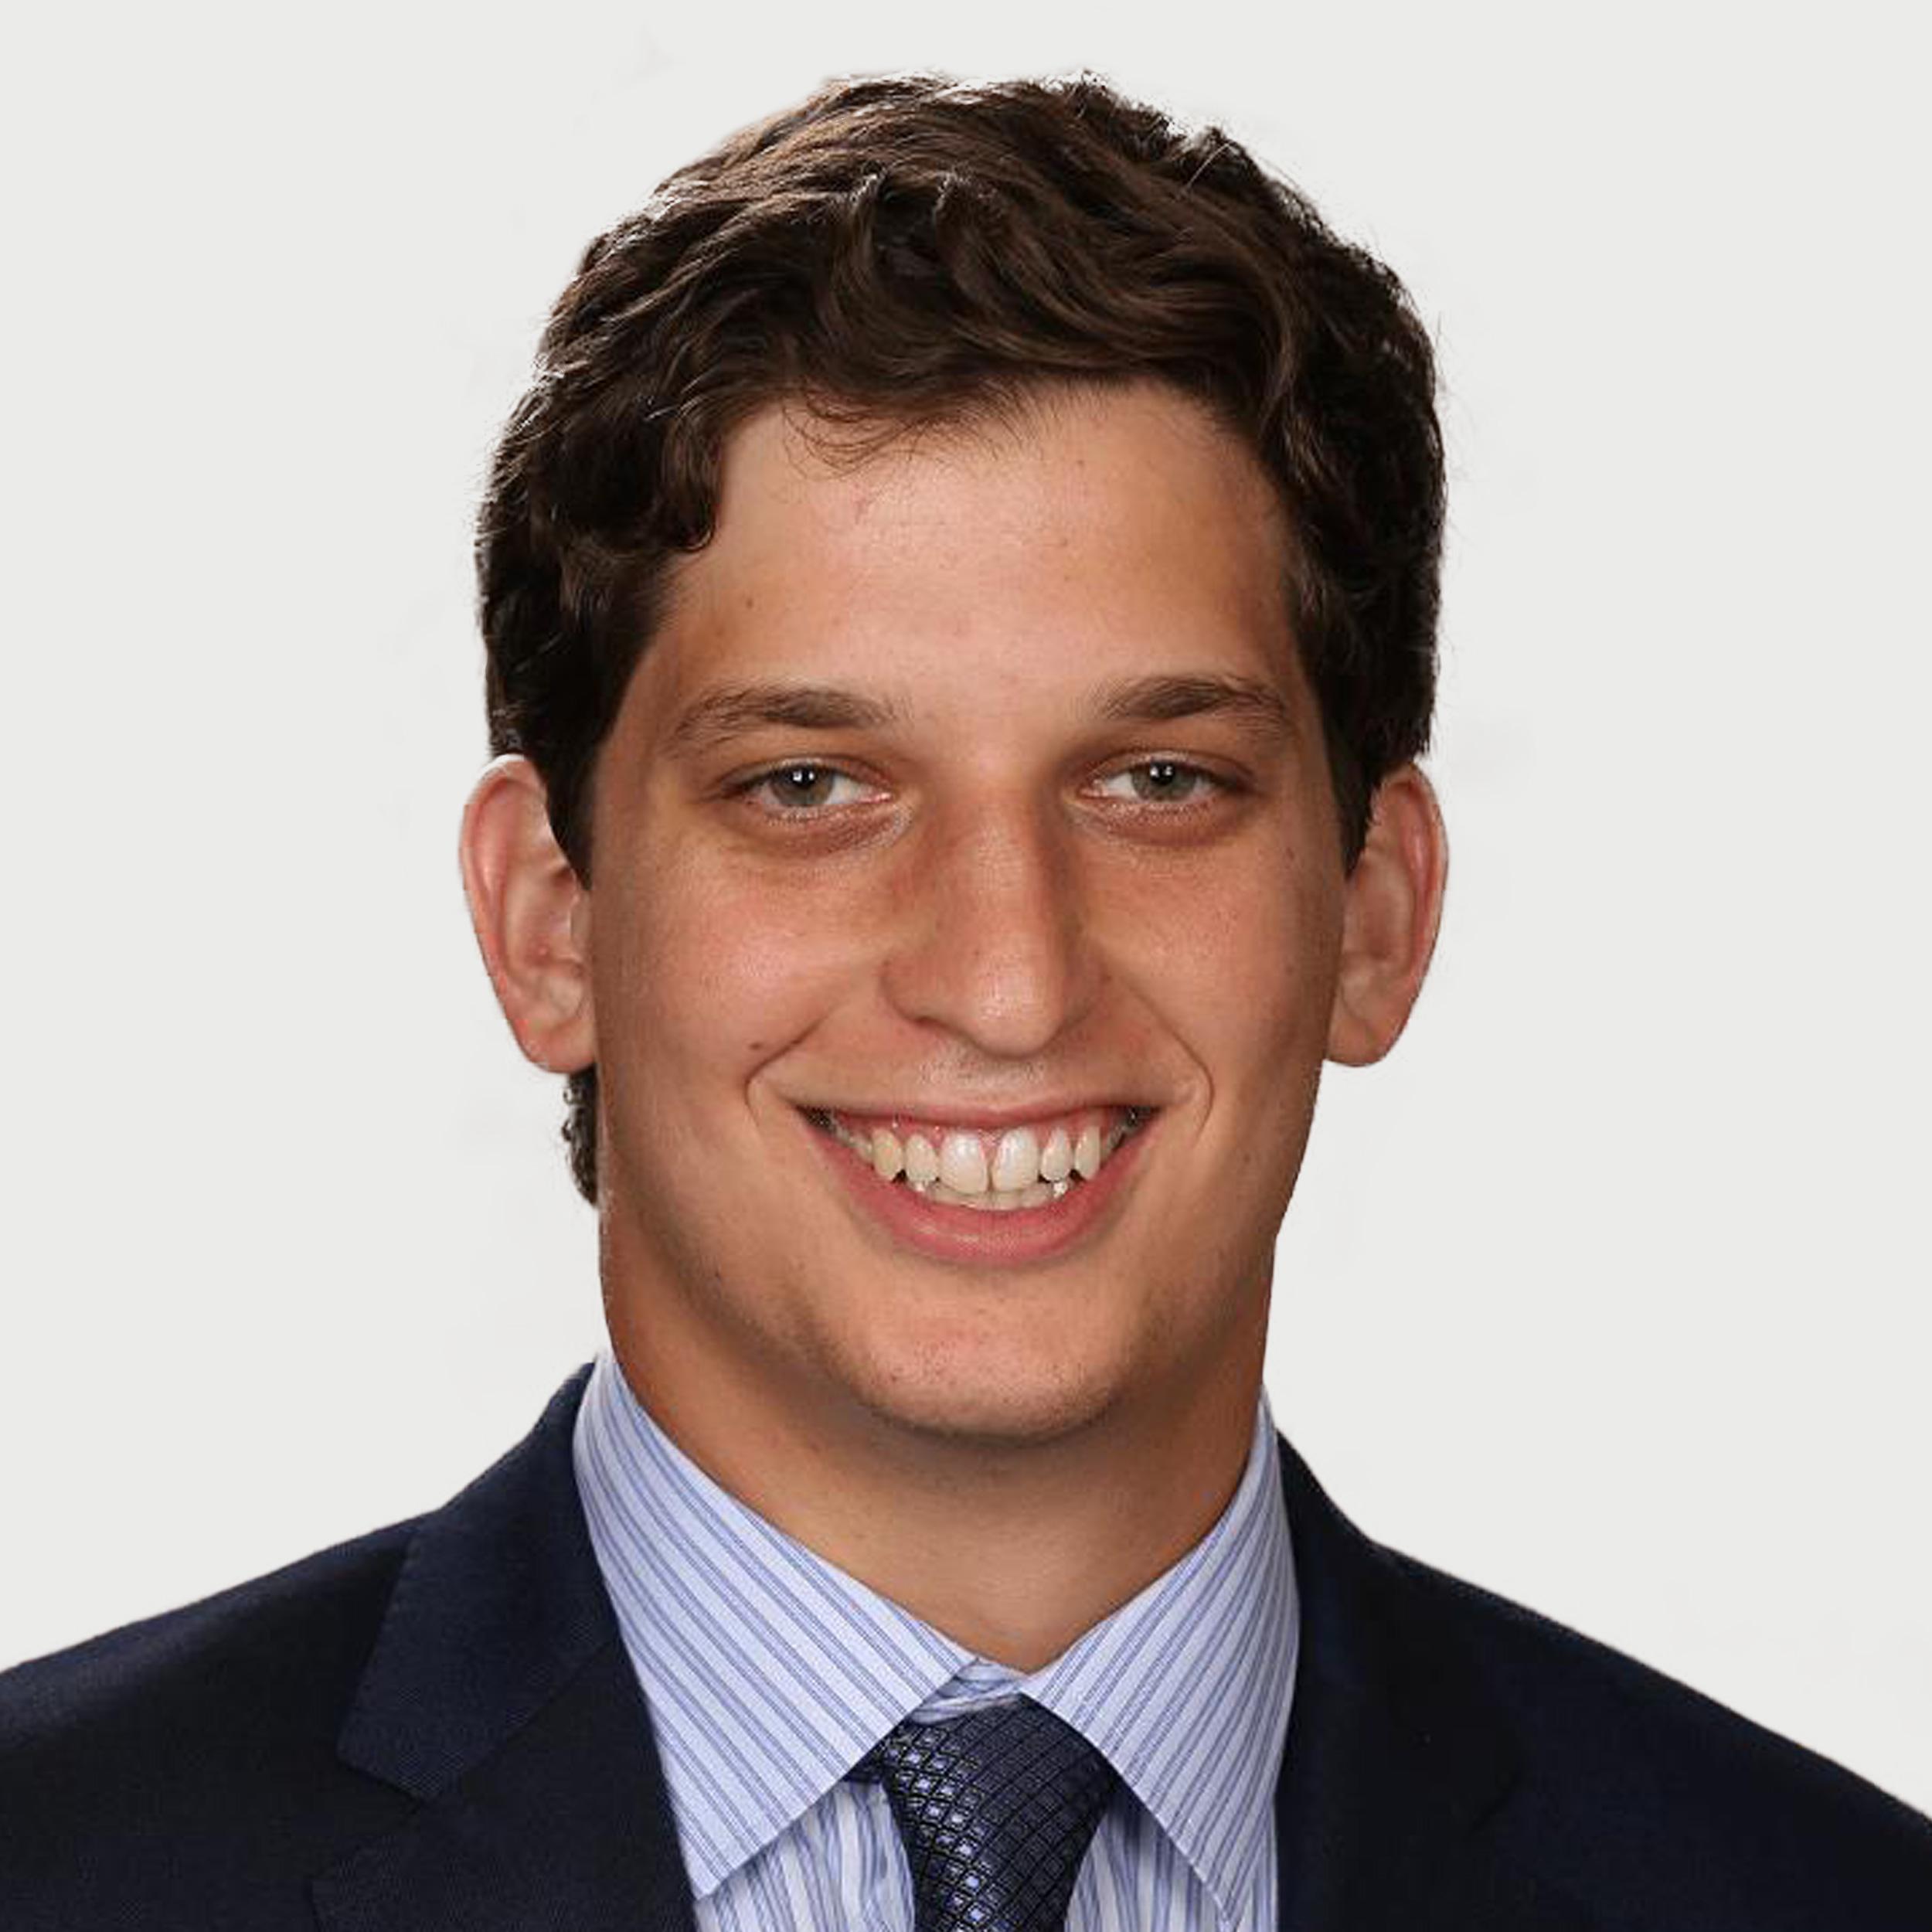 Jared Shimberg